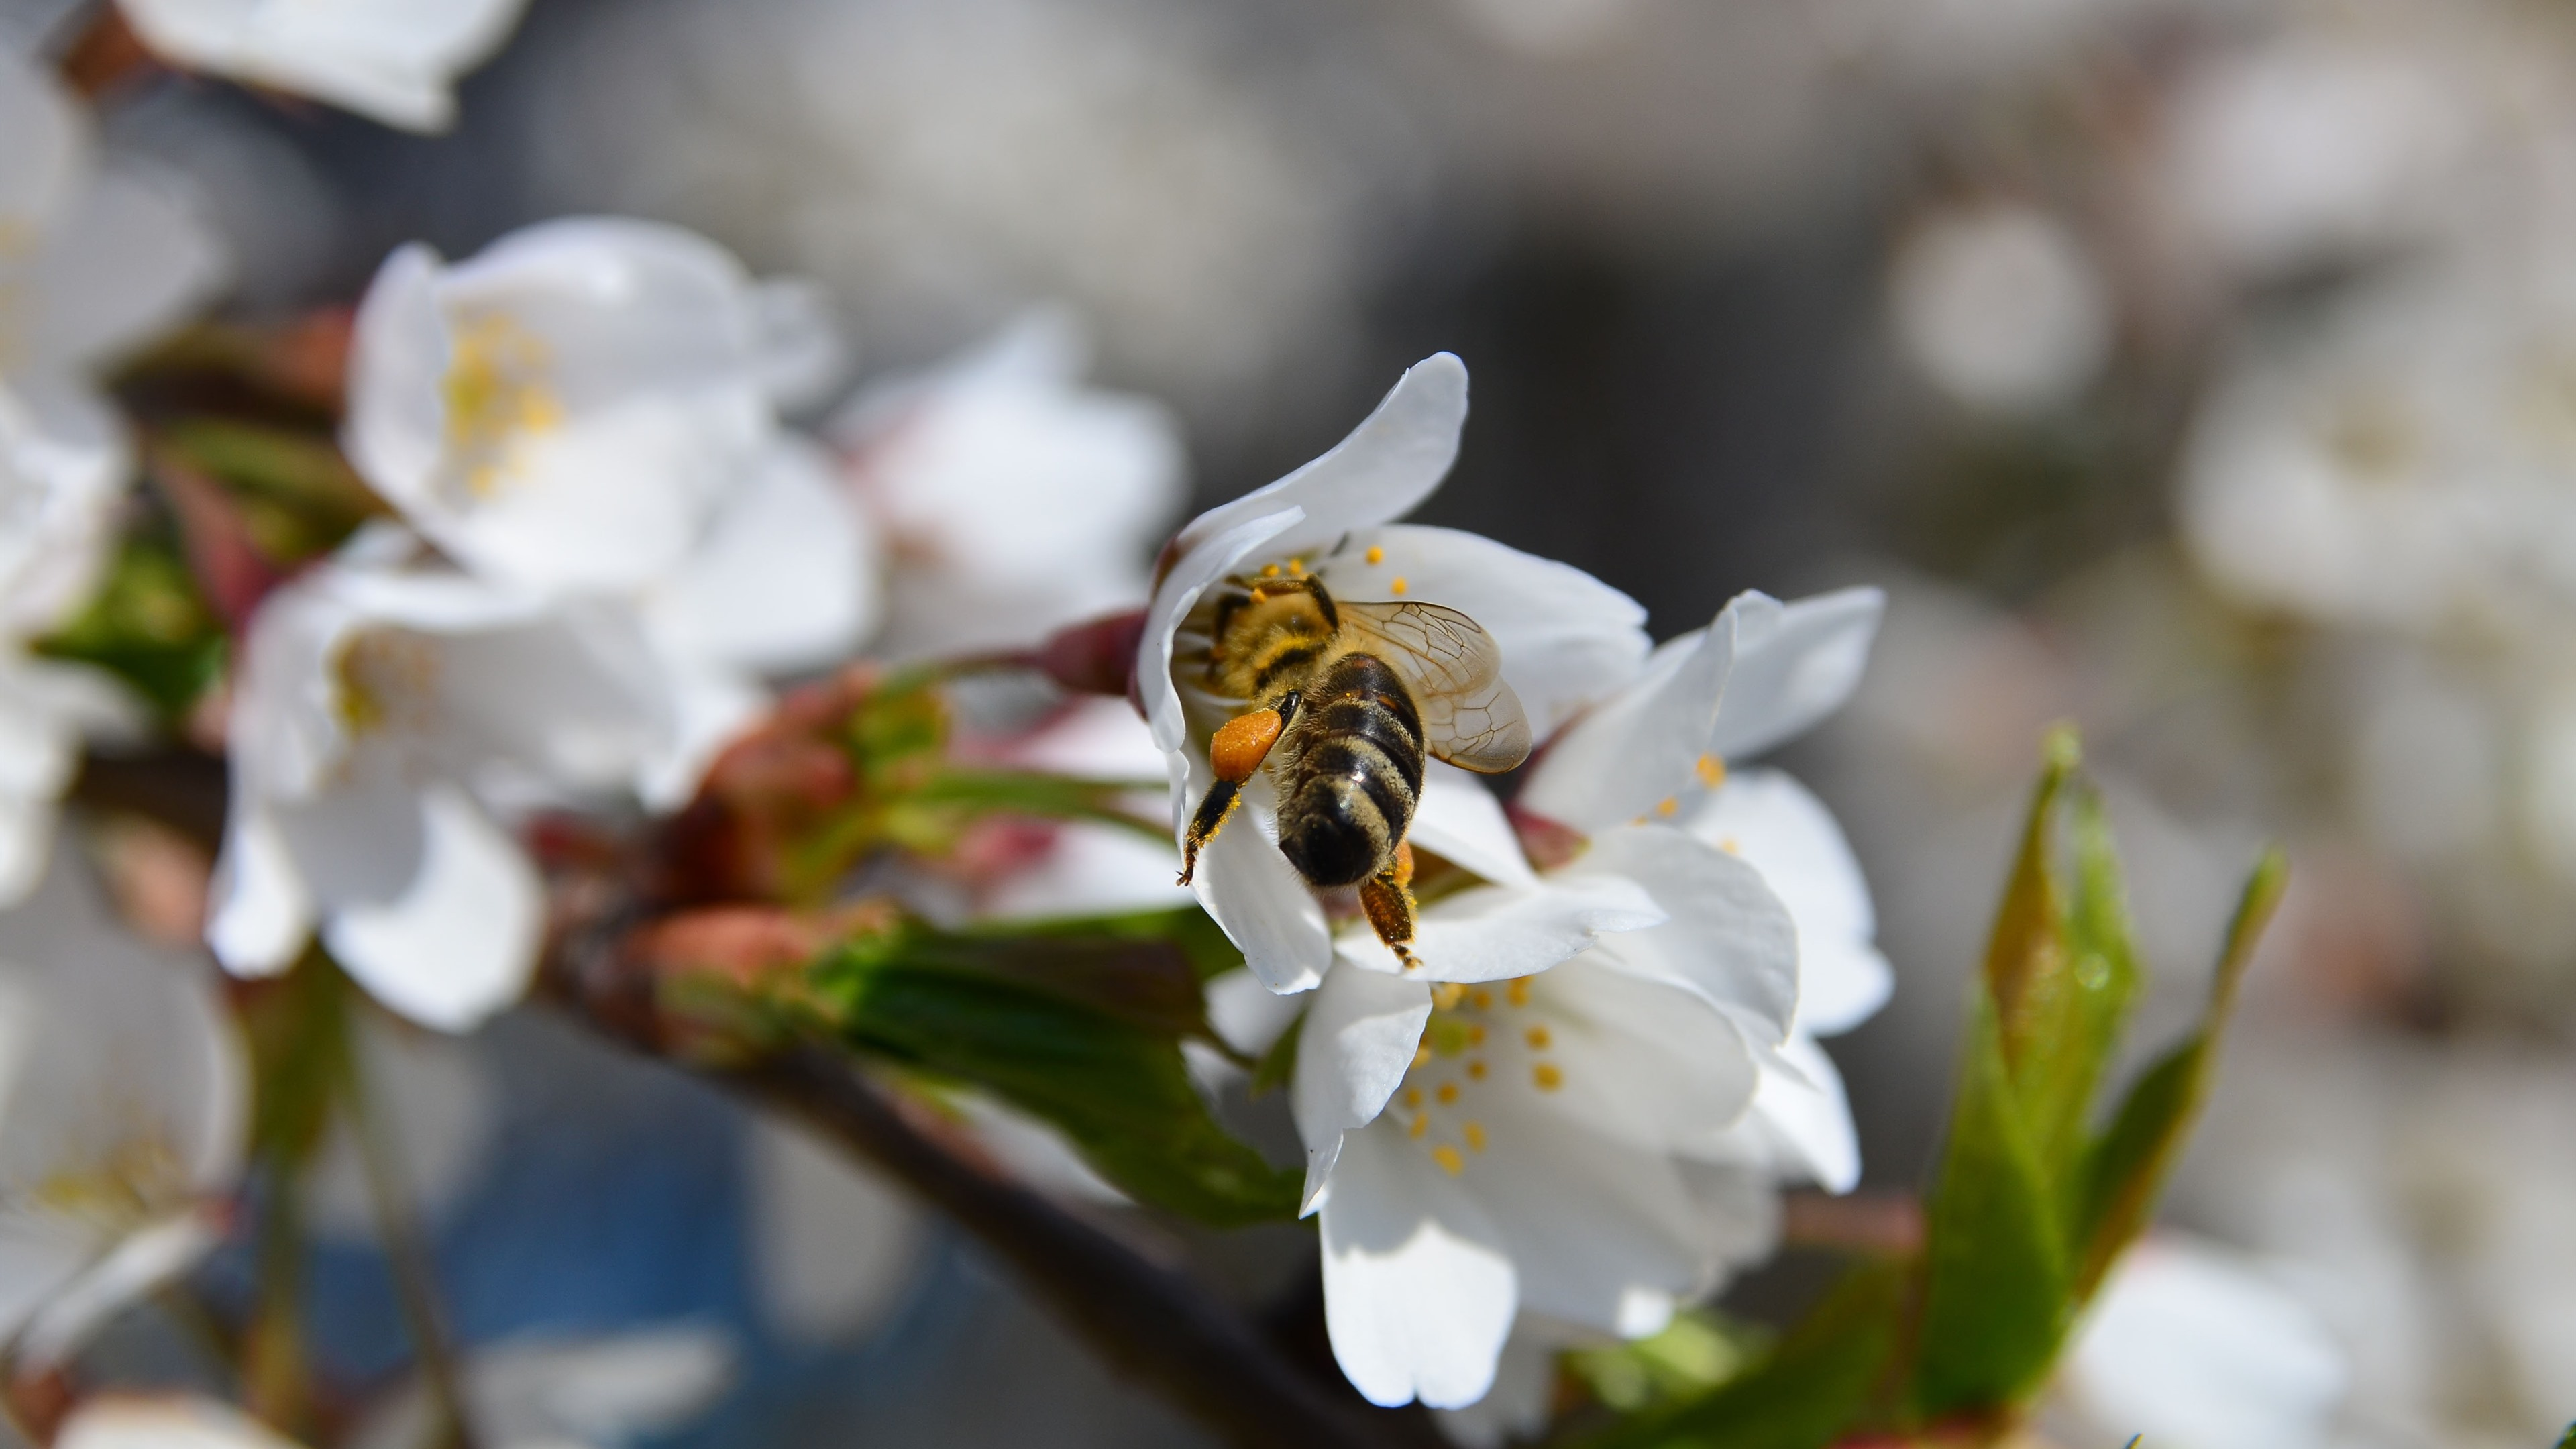 Wallpaper Spring, White Flowers Bloom, Bee 3840x2160 UHD